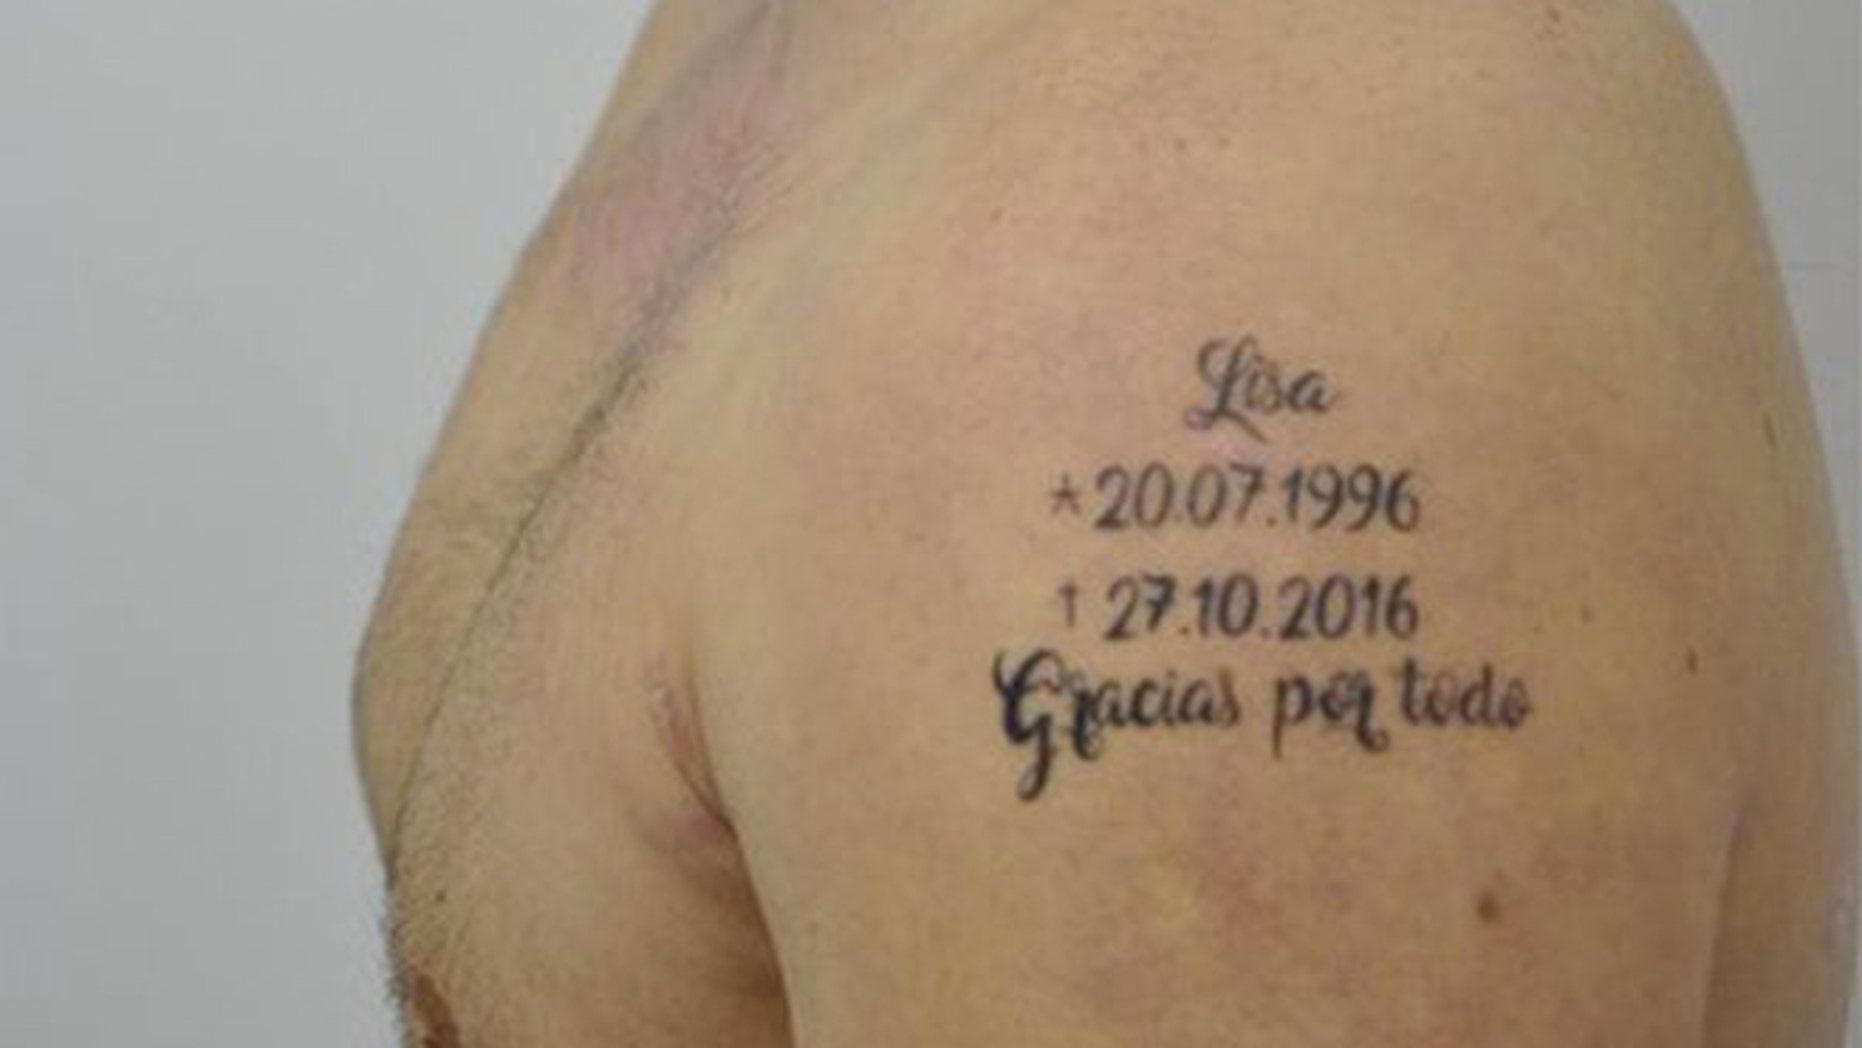 A close-up of the tell-tale tattoo. (Photo: Spain's Policia Nacional)